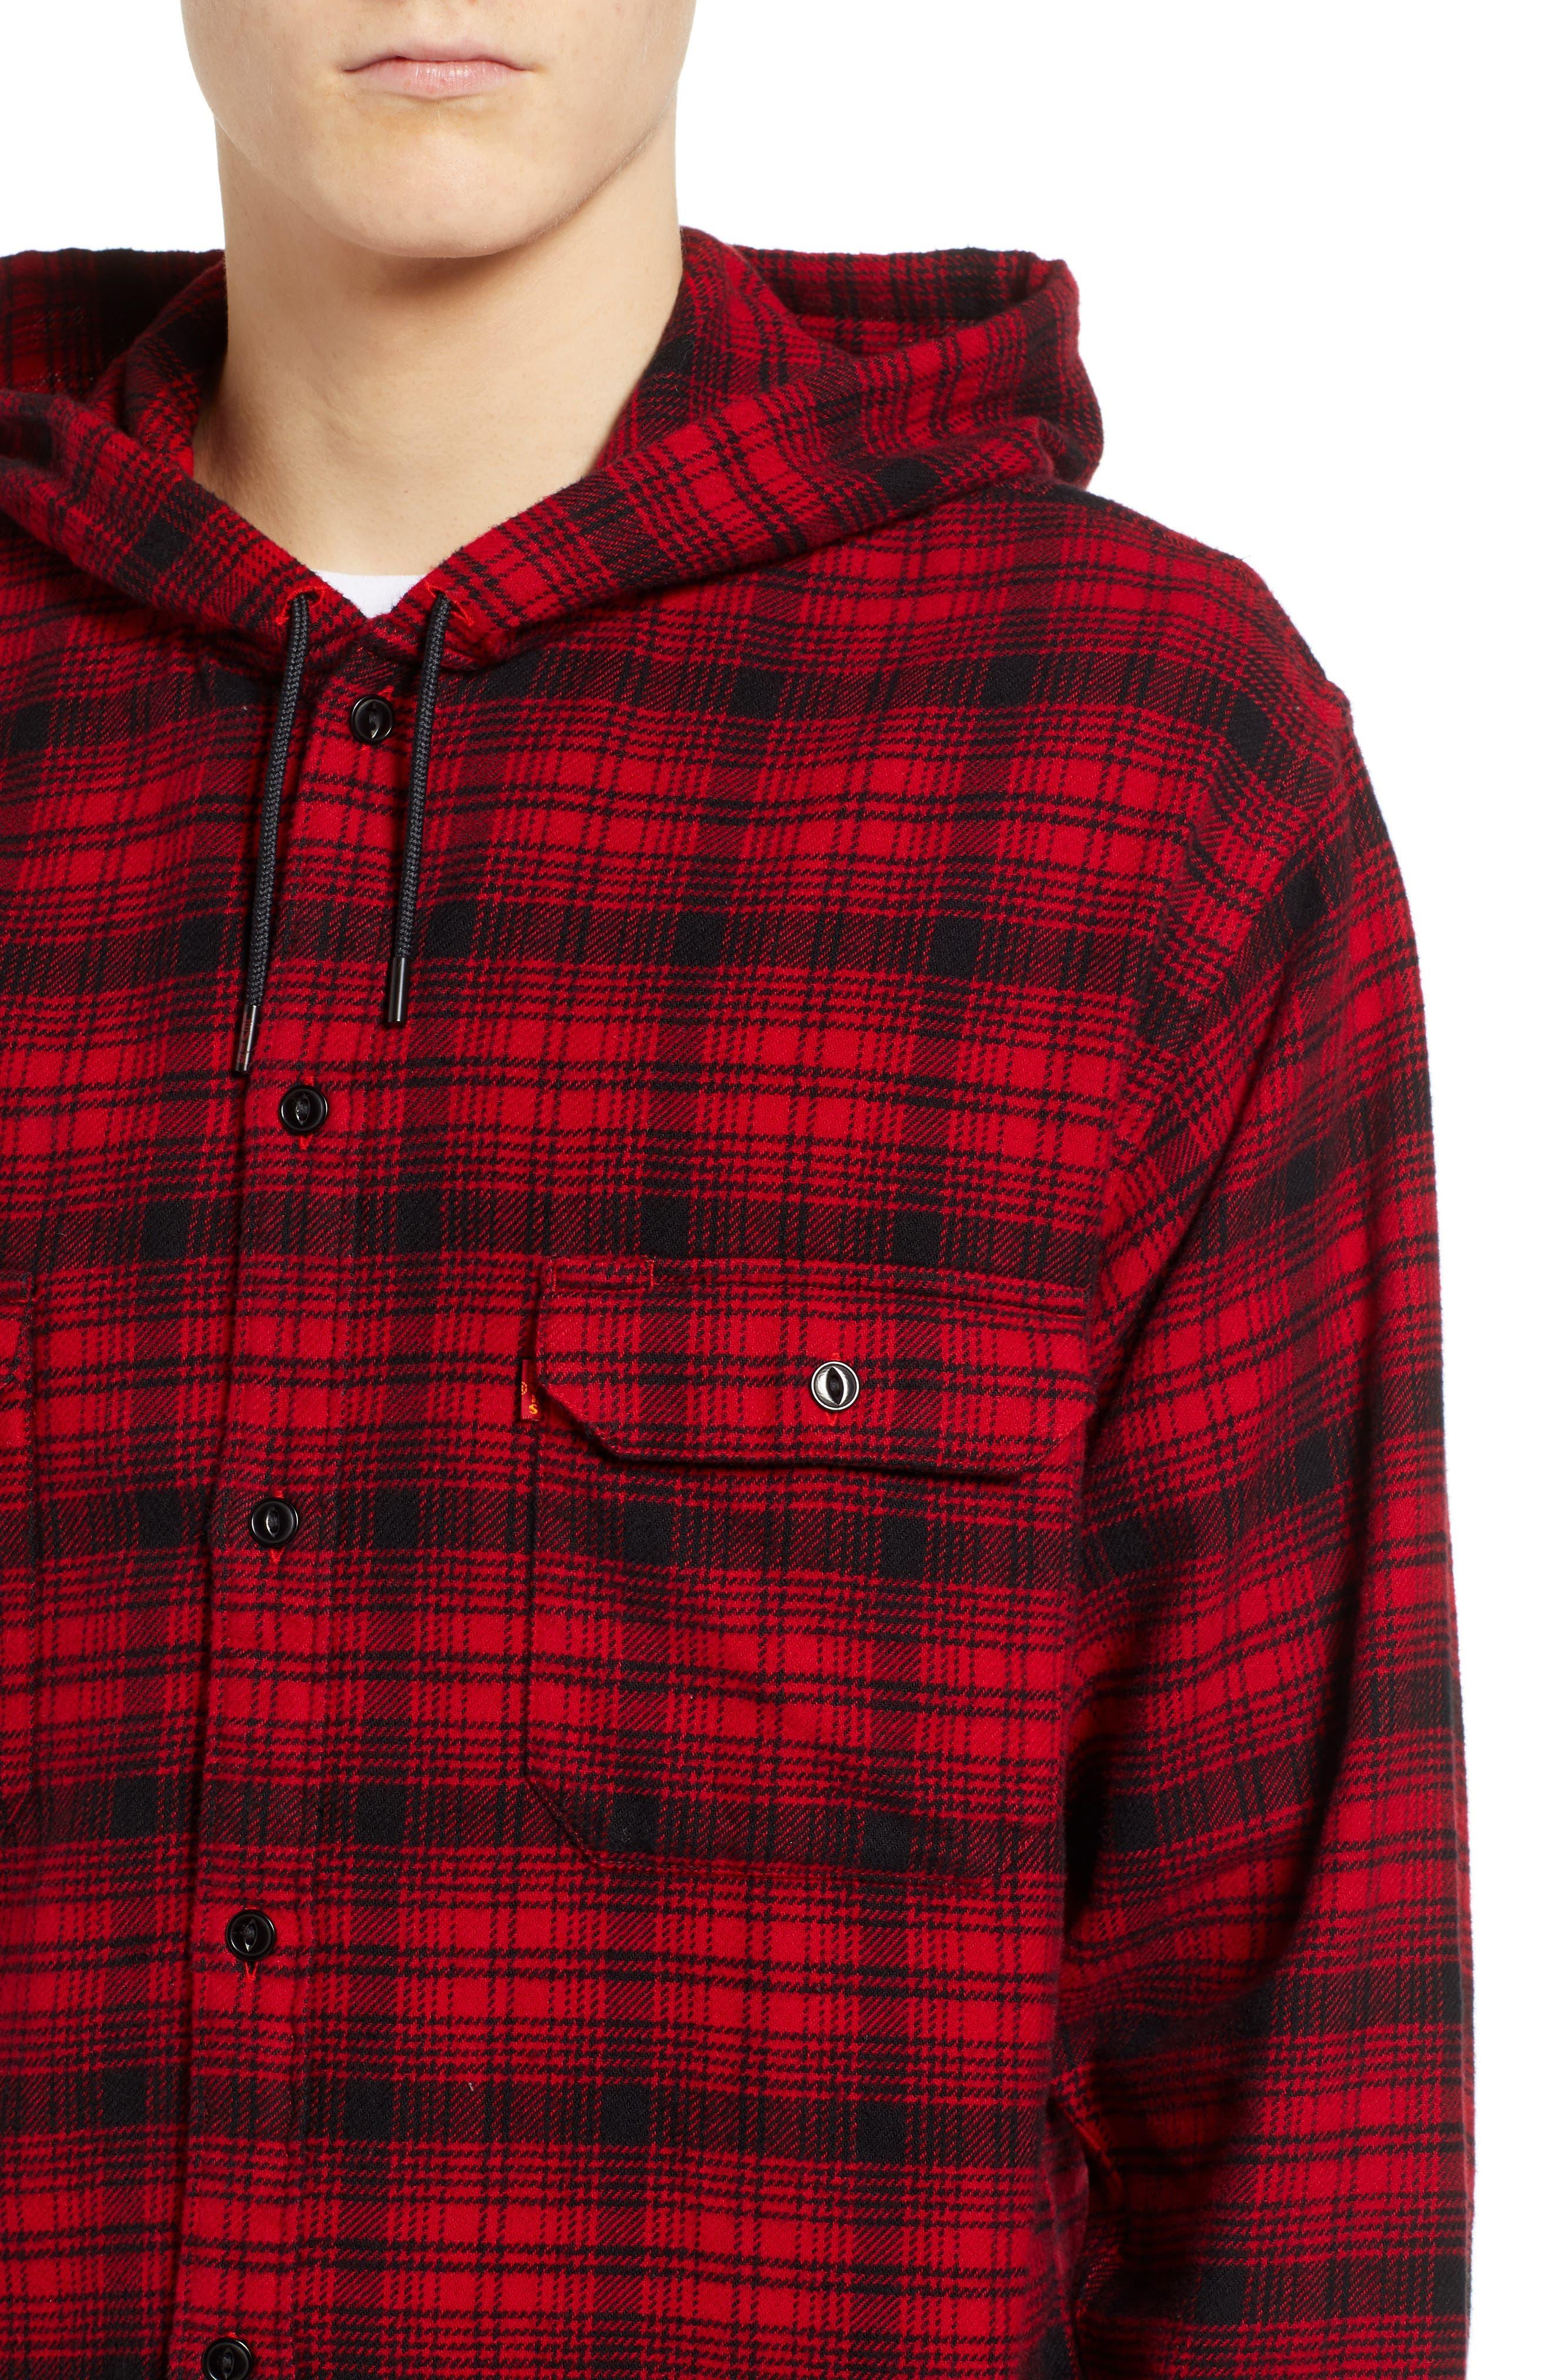 x Justin Timberlake Hooded Flannel Worker Shirt,                             Alternate thumbnail 5, color,                             SERVAL CRIMSON